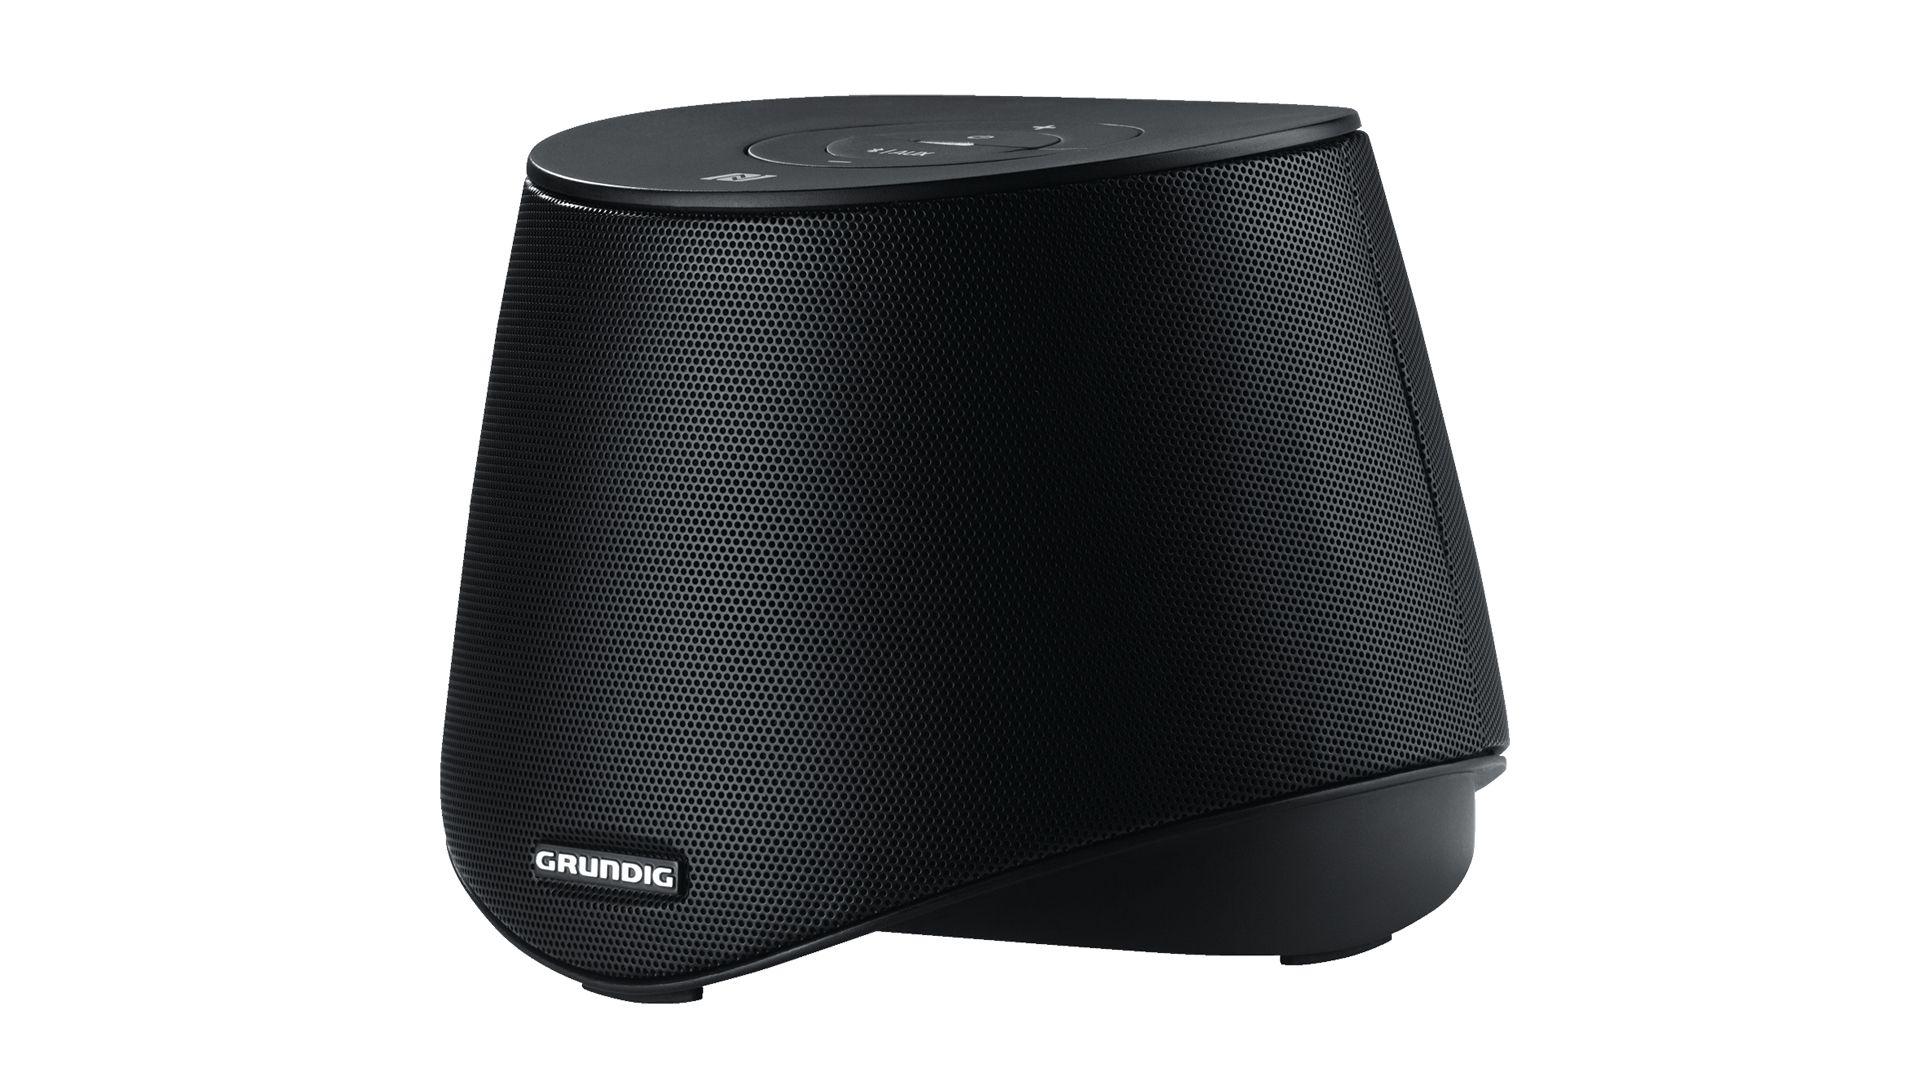 Diffusore acustico wireless Grundig